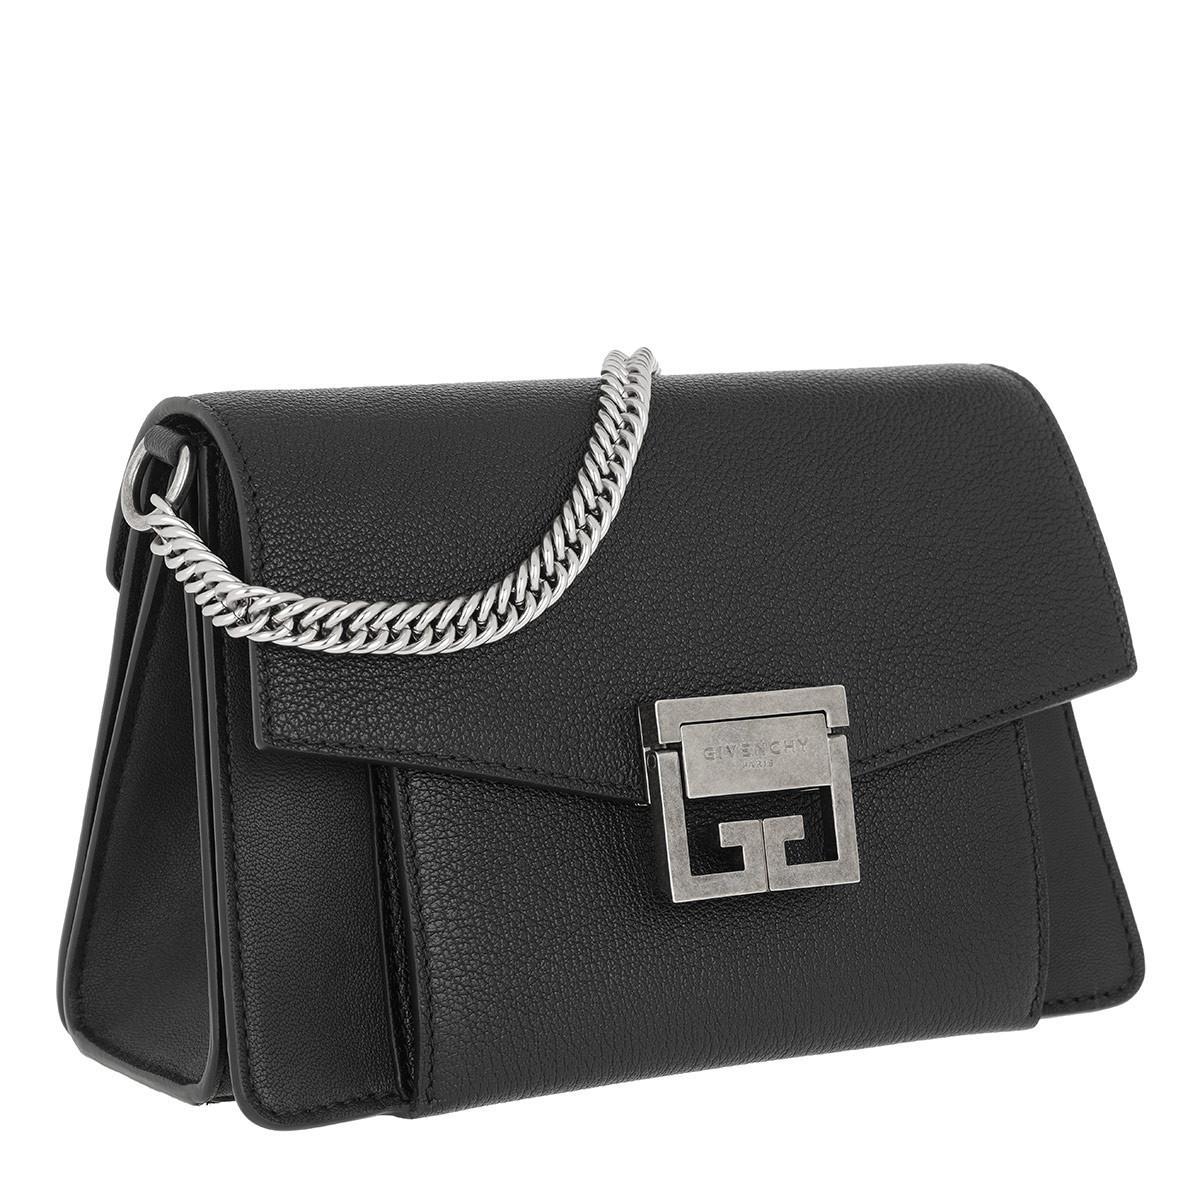 093d36fcb968 Givenchy - Gv3 Nano Crossbody Bag Leather Black - Lyst. View fullscreen